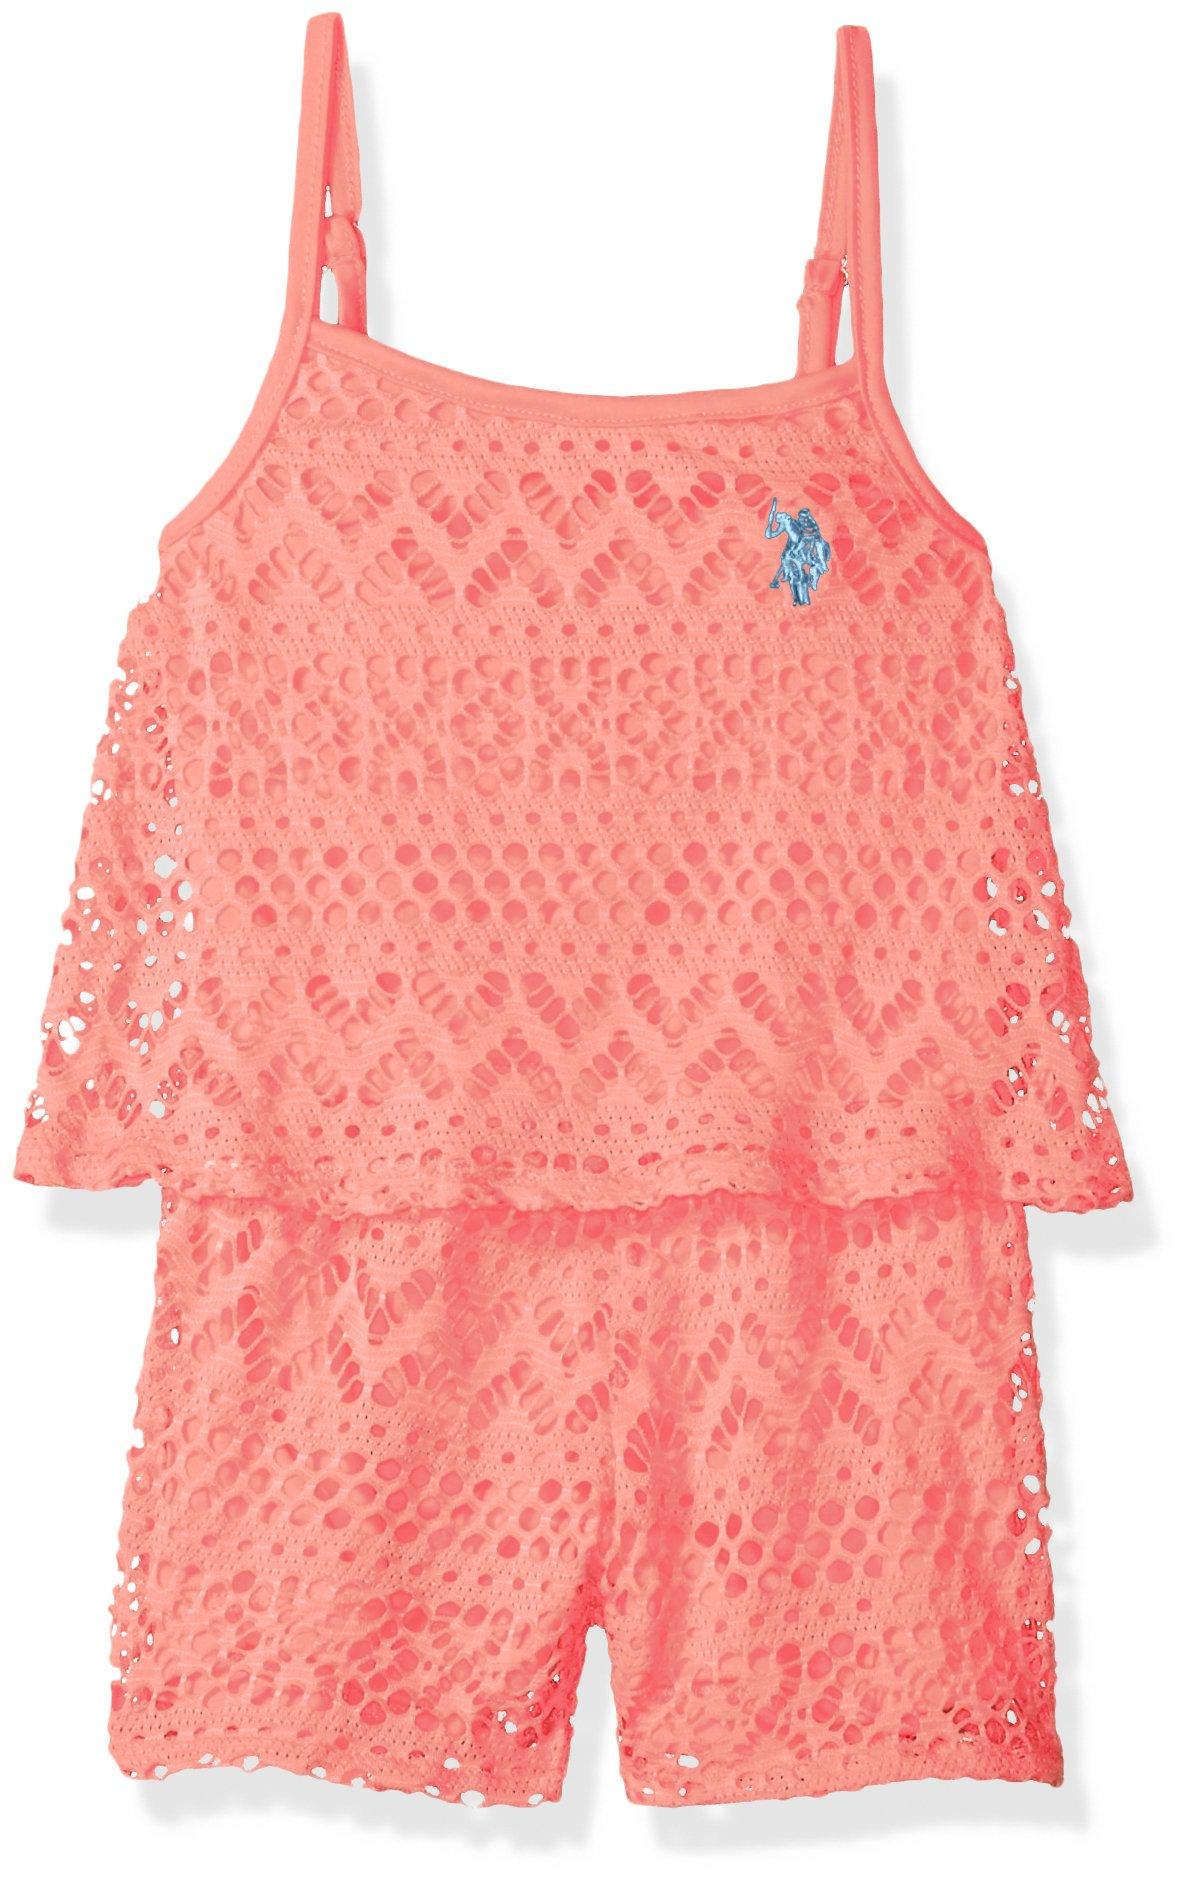 U.S. Polo Assn. Little Girls' Romper, Bell Sleeve Neckline Embro Romper Neon Light Coral, 5/6